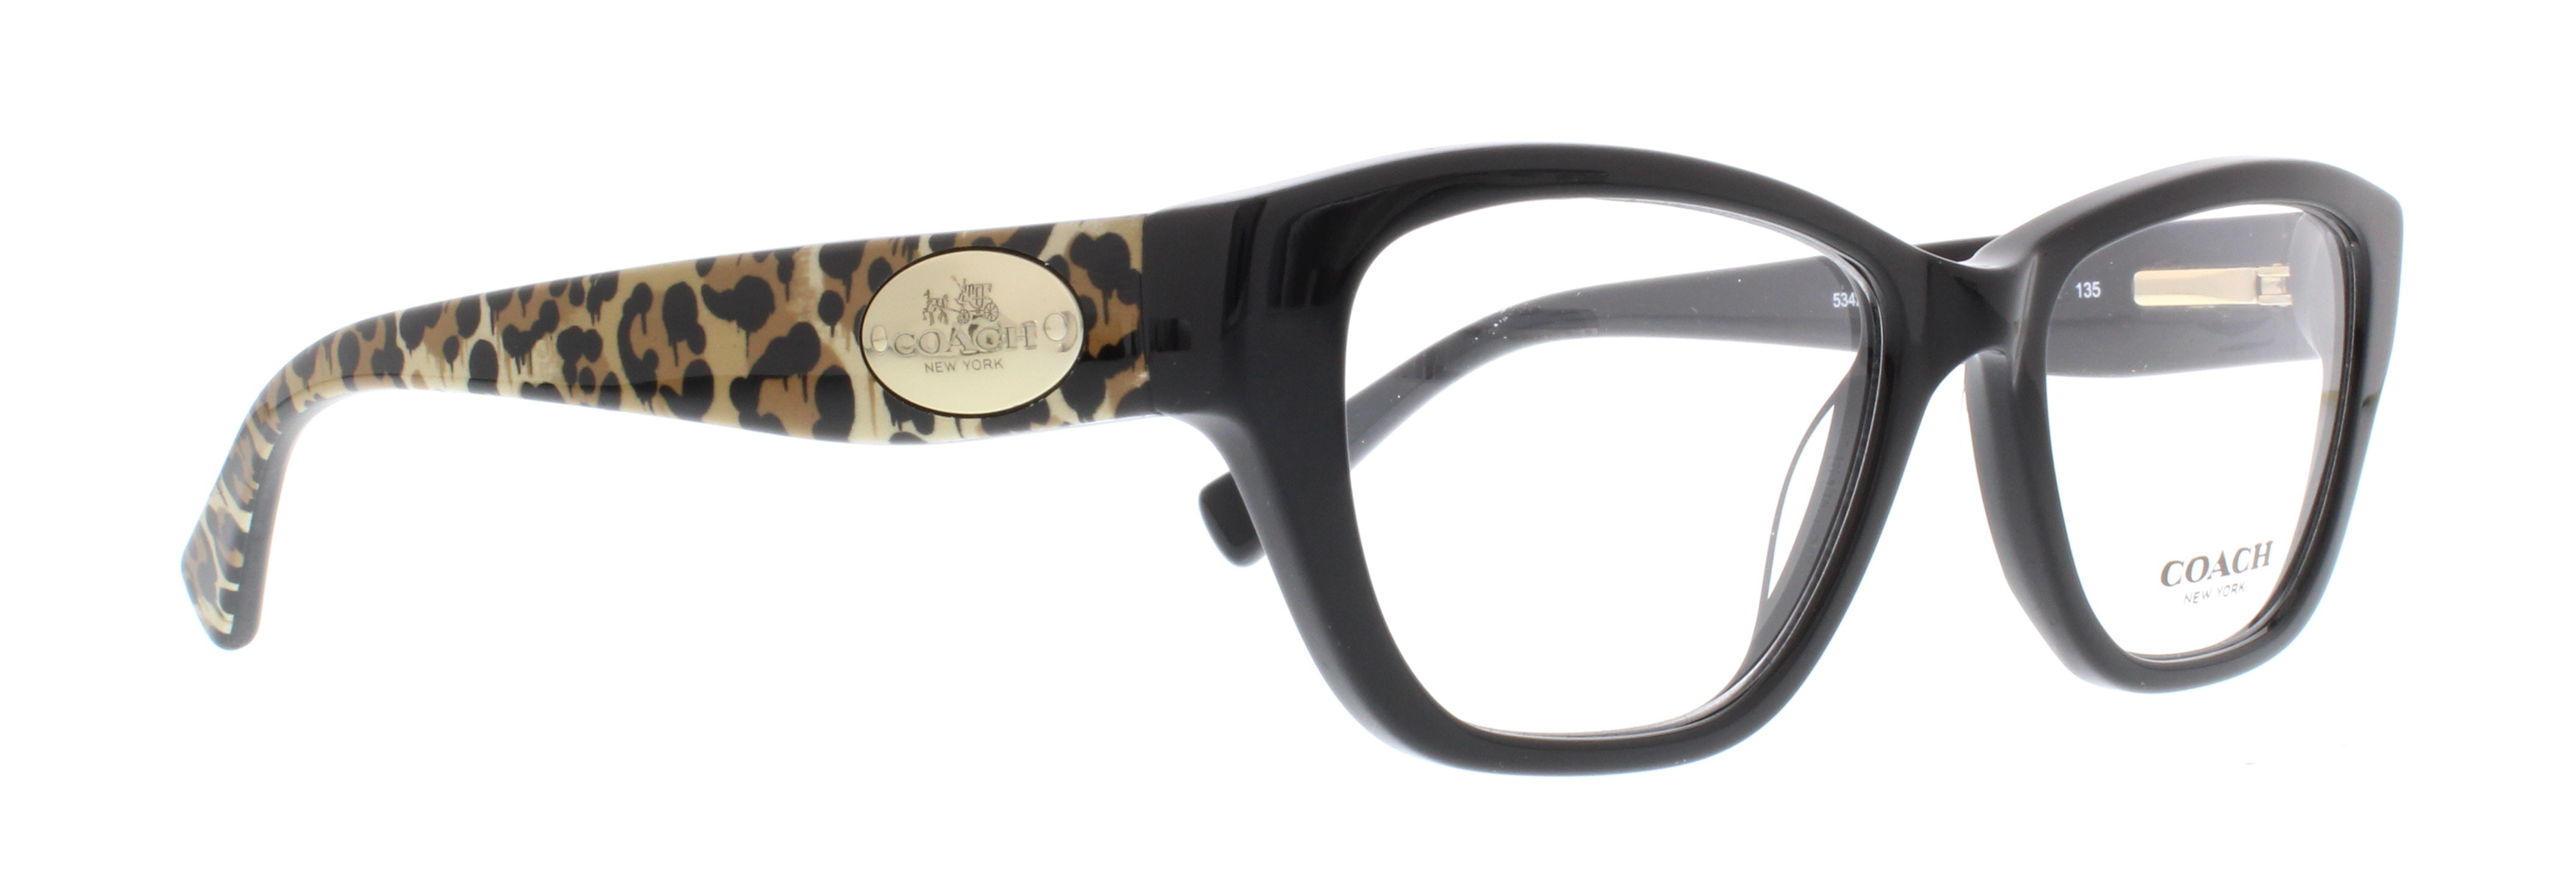 3b49b7dd0c COACH Eyeglasses HC 6070 5342 Black Wild Beast 51MM - Walmart.com